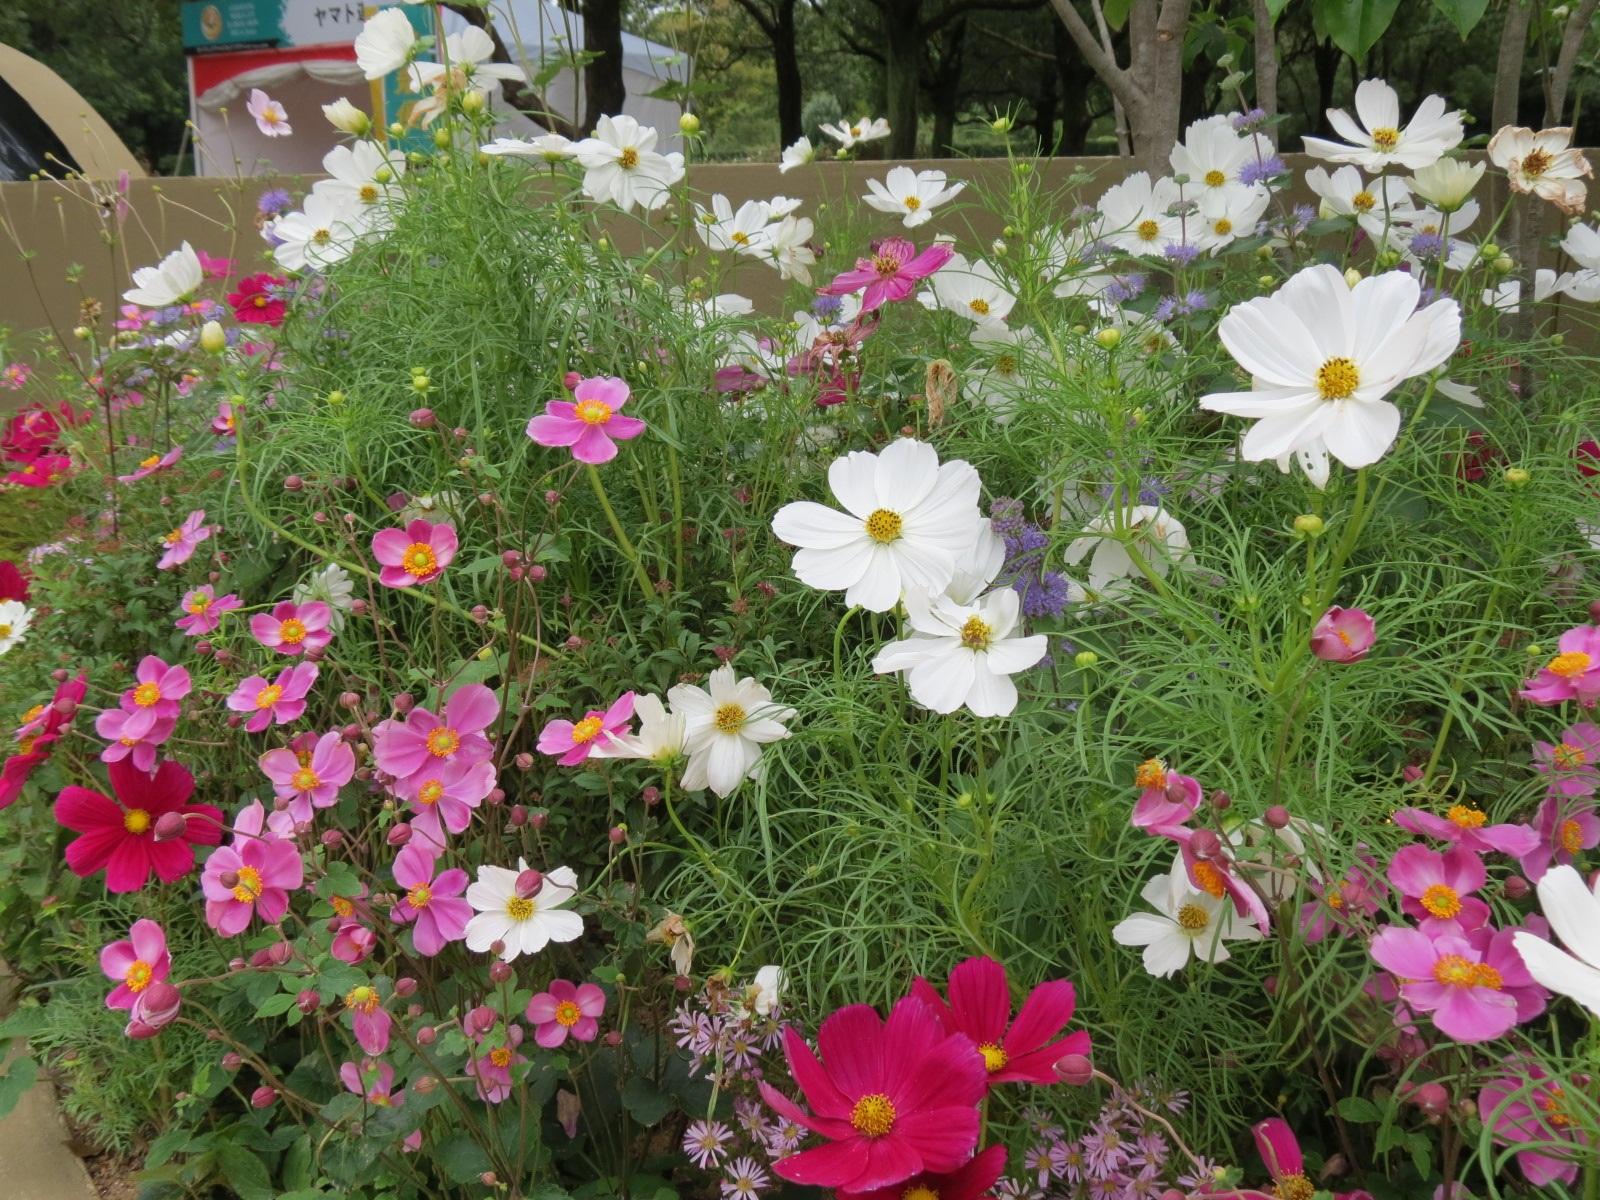 Japan Garden Flowers: The Constant Gardener: Postcard From Japan: The Home Team